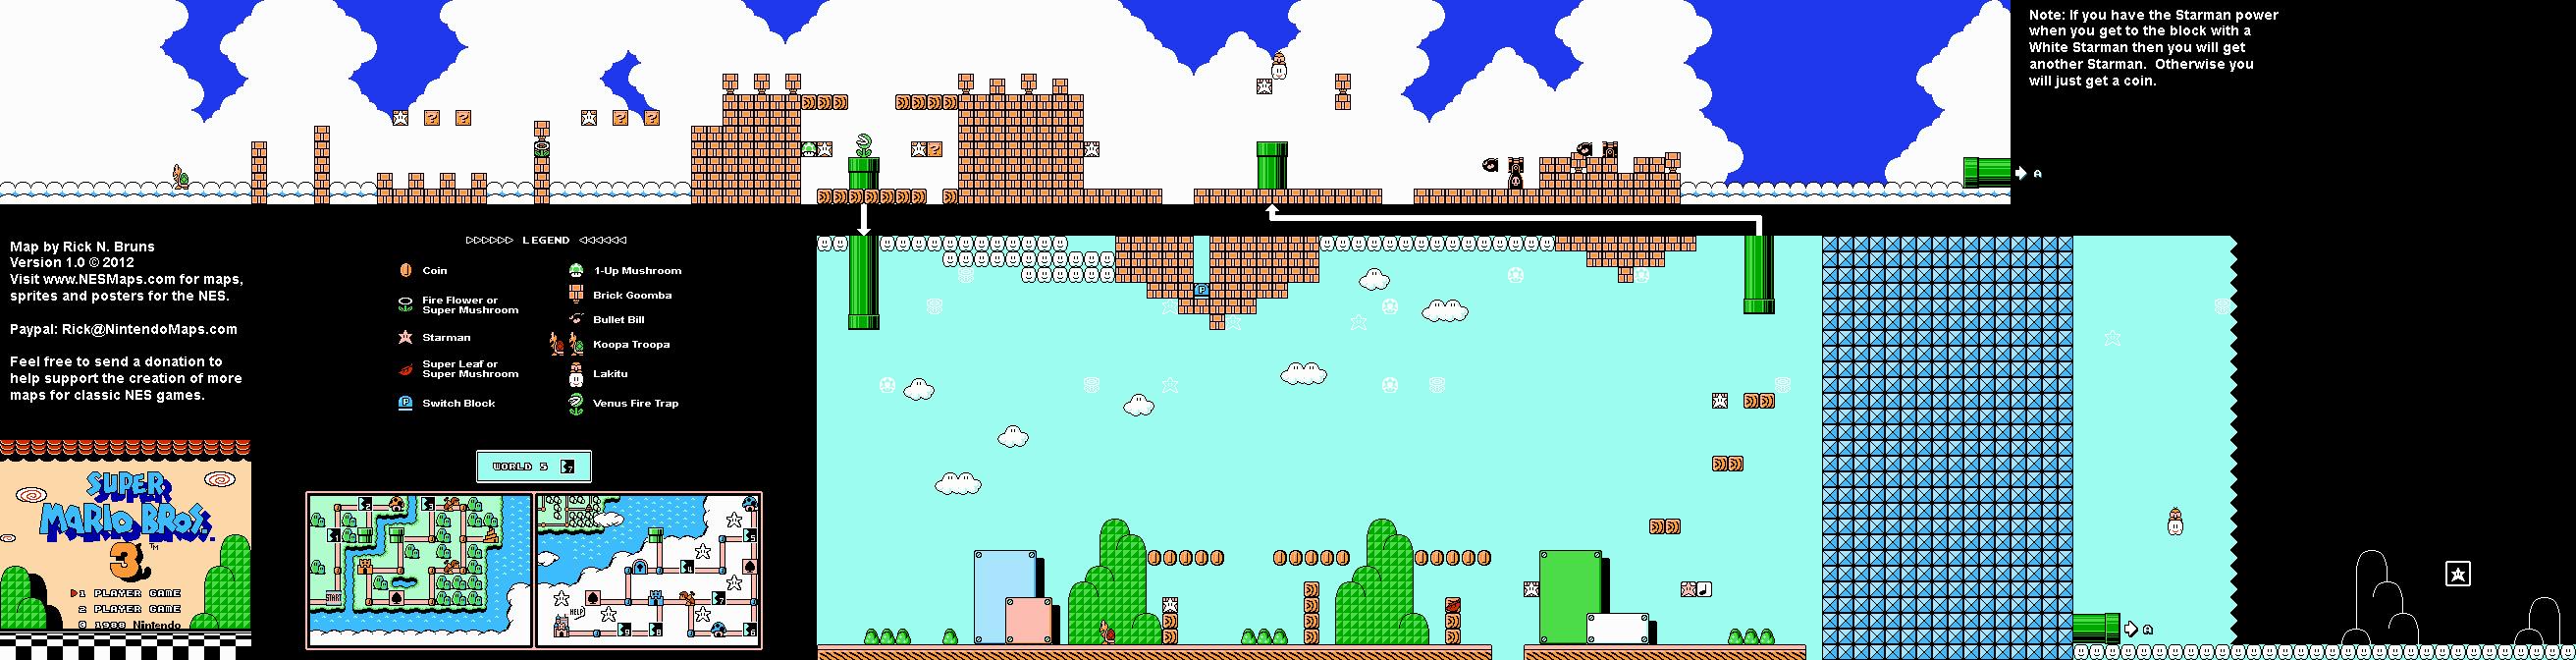 Mario 3 World Map.Super Mario Brothers 3 World 5 7 Nintendo Nes Map